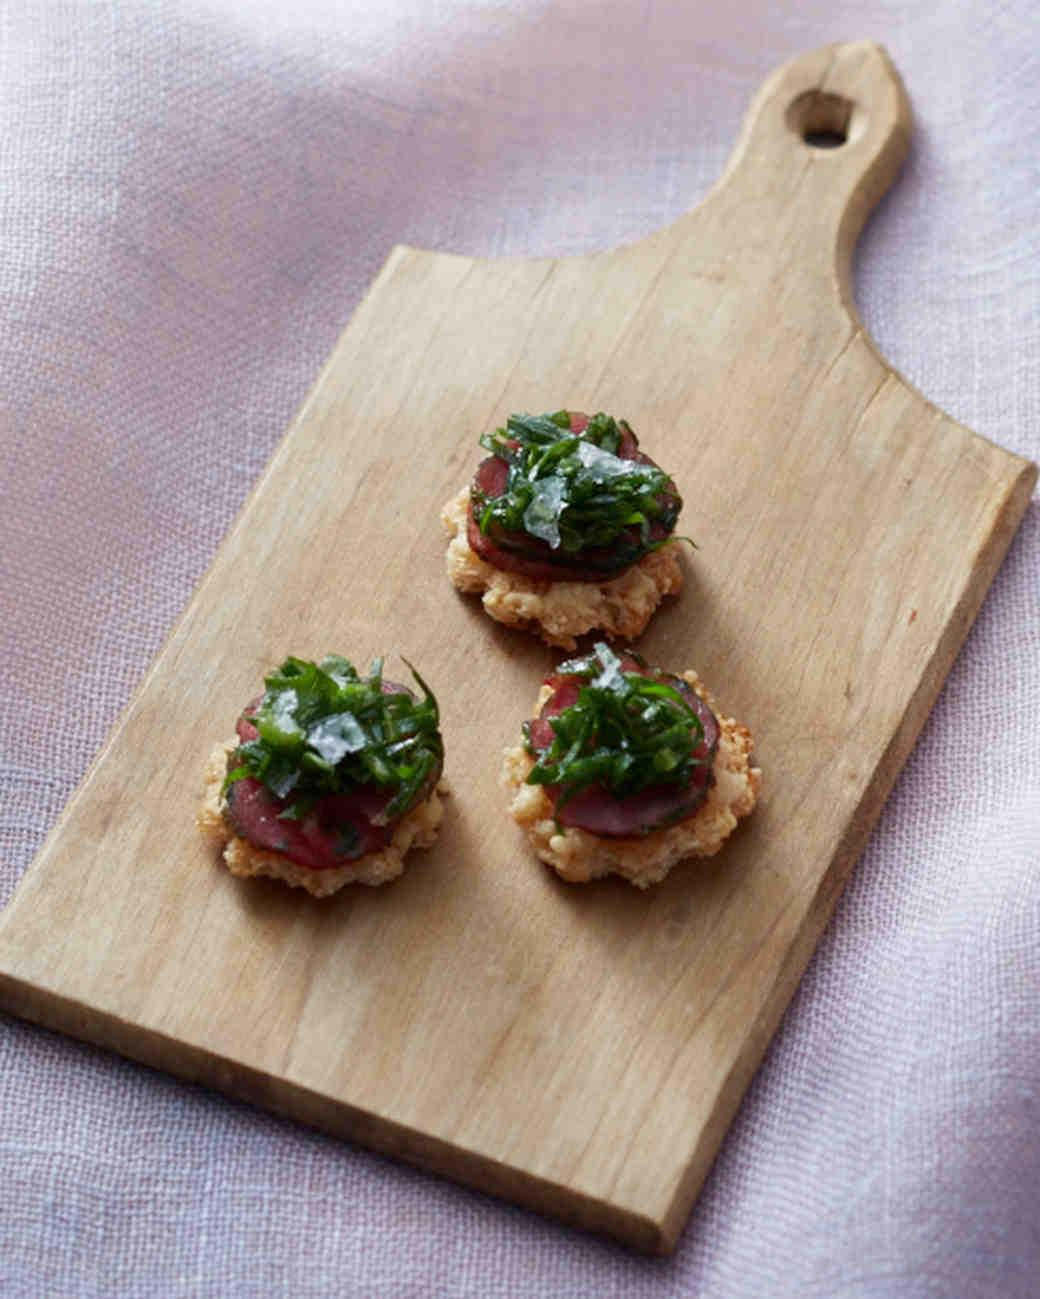 gluten-free-appetizers-beef-carpaccio-truffled-arugula-parmesan-crisps-074-d112317-fallsip15-1115.jpg